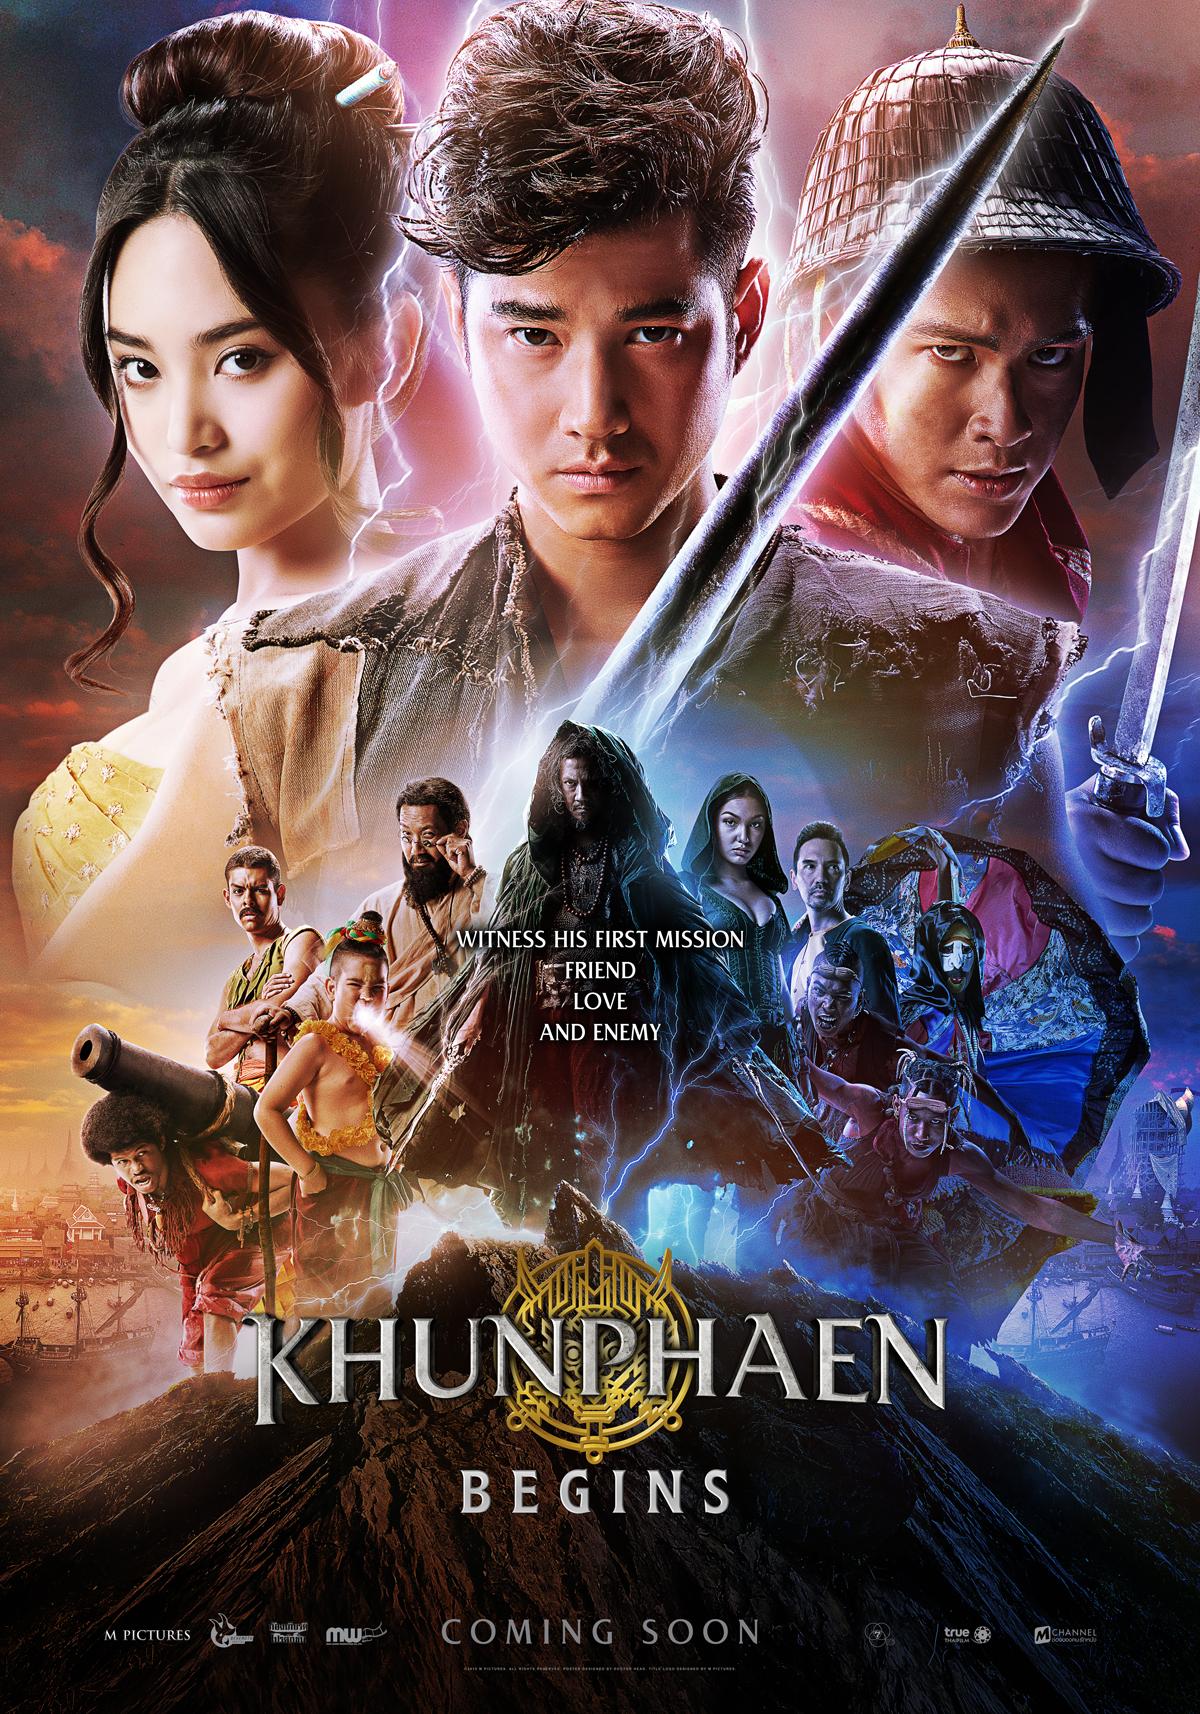 khun-phaen-begins-2019-